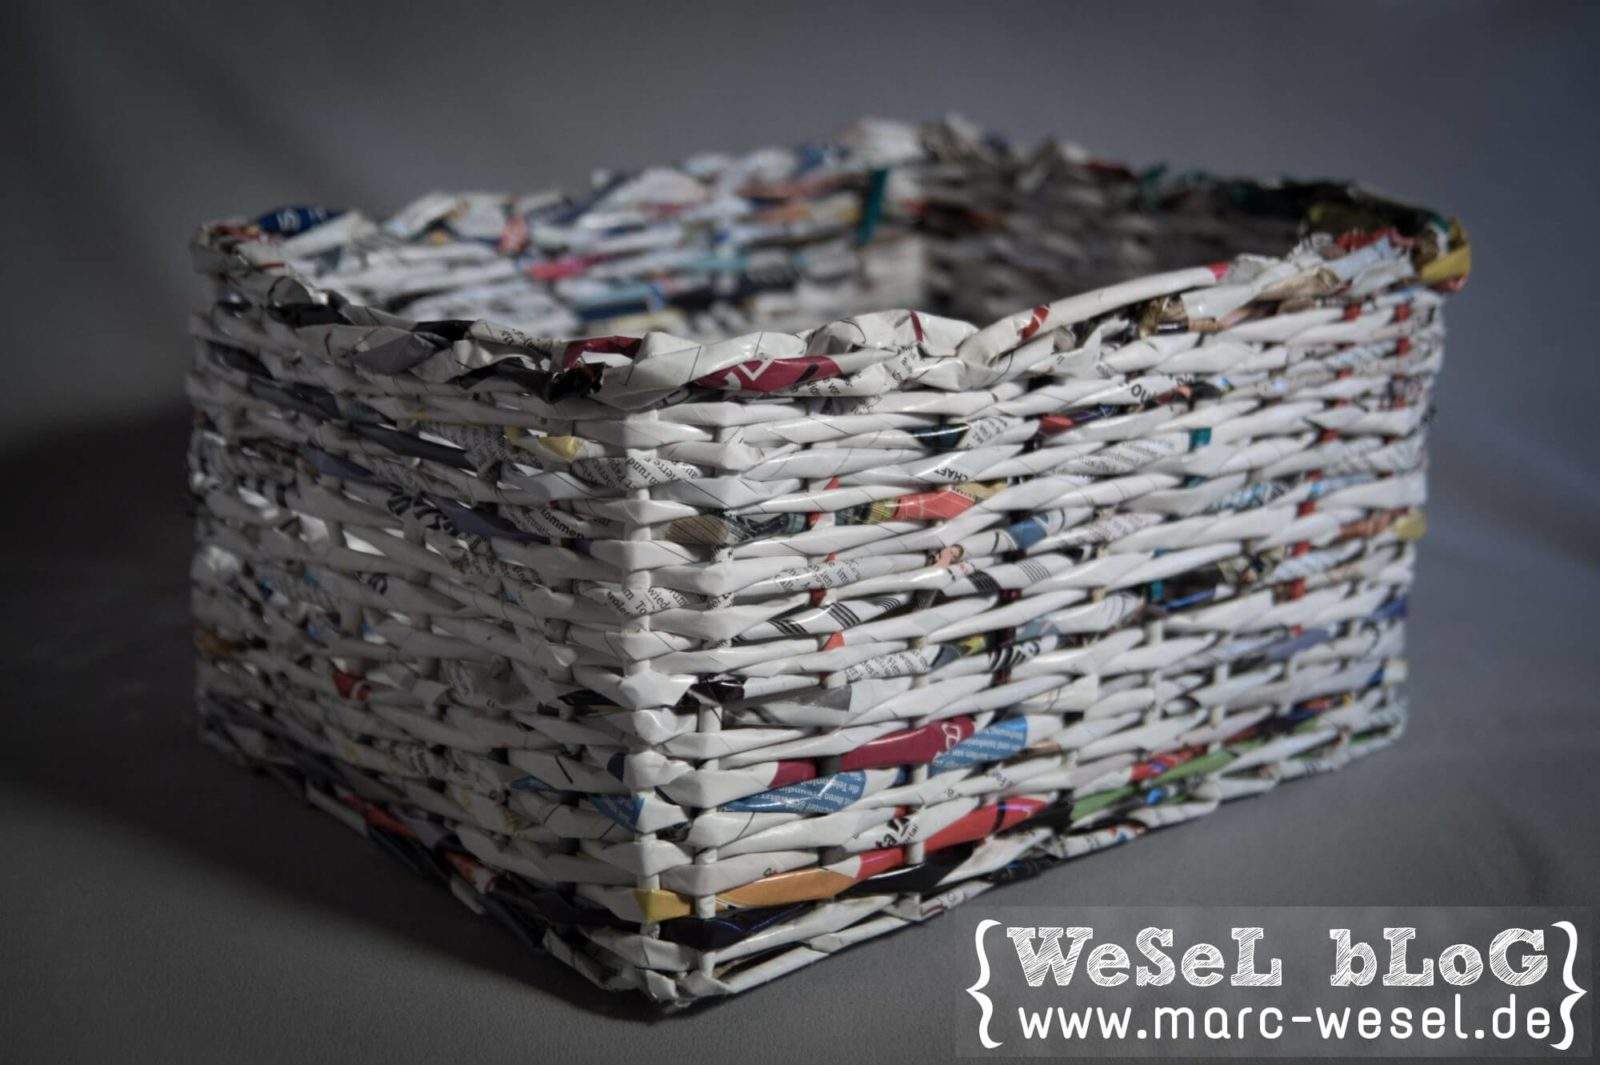 zeitungsst nder korb aus papier upcycling handmade. Black Bedroom Furniture Sets. Home Design Ideas